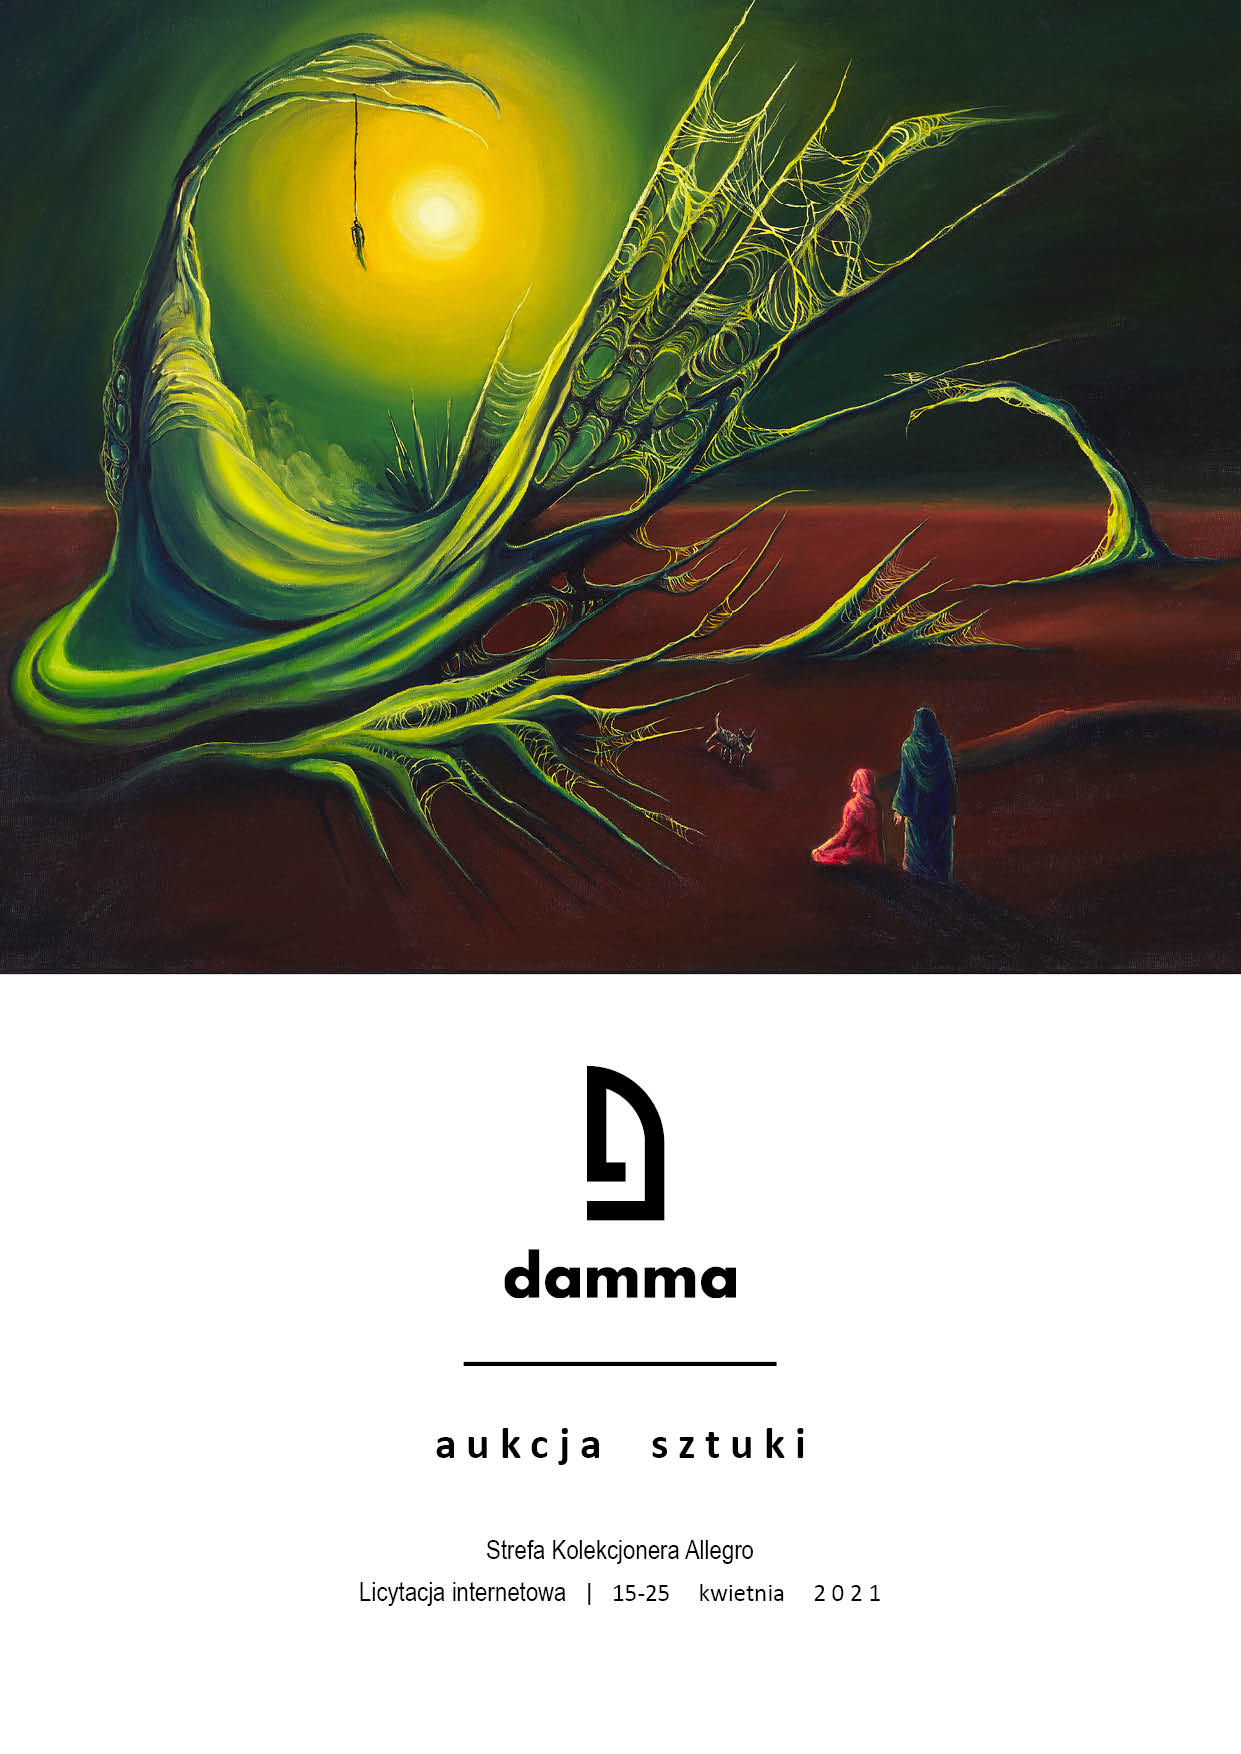 Katalog aukcji sztuki 11